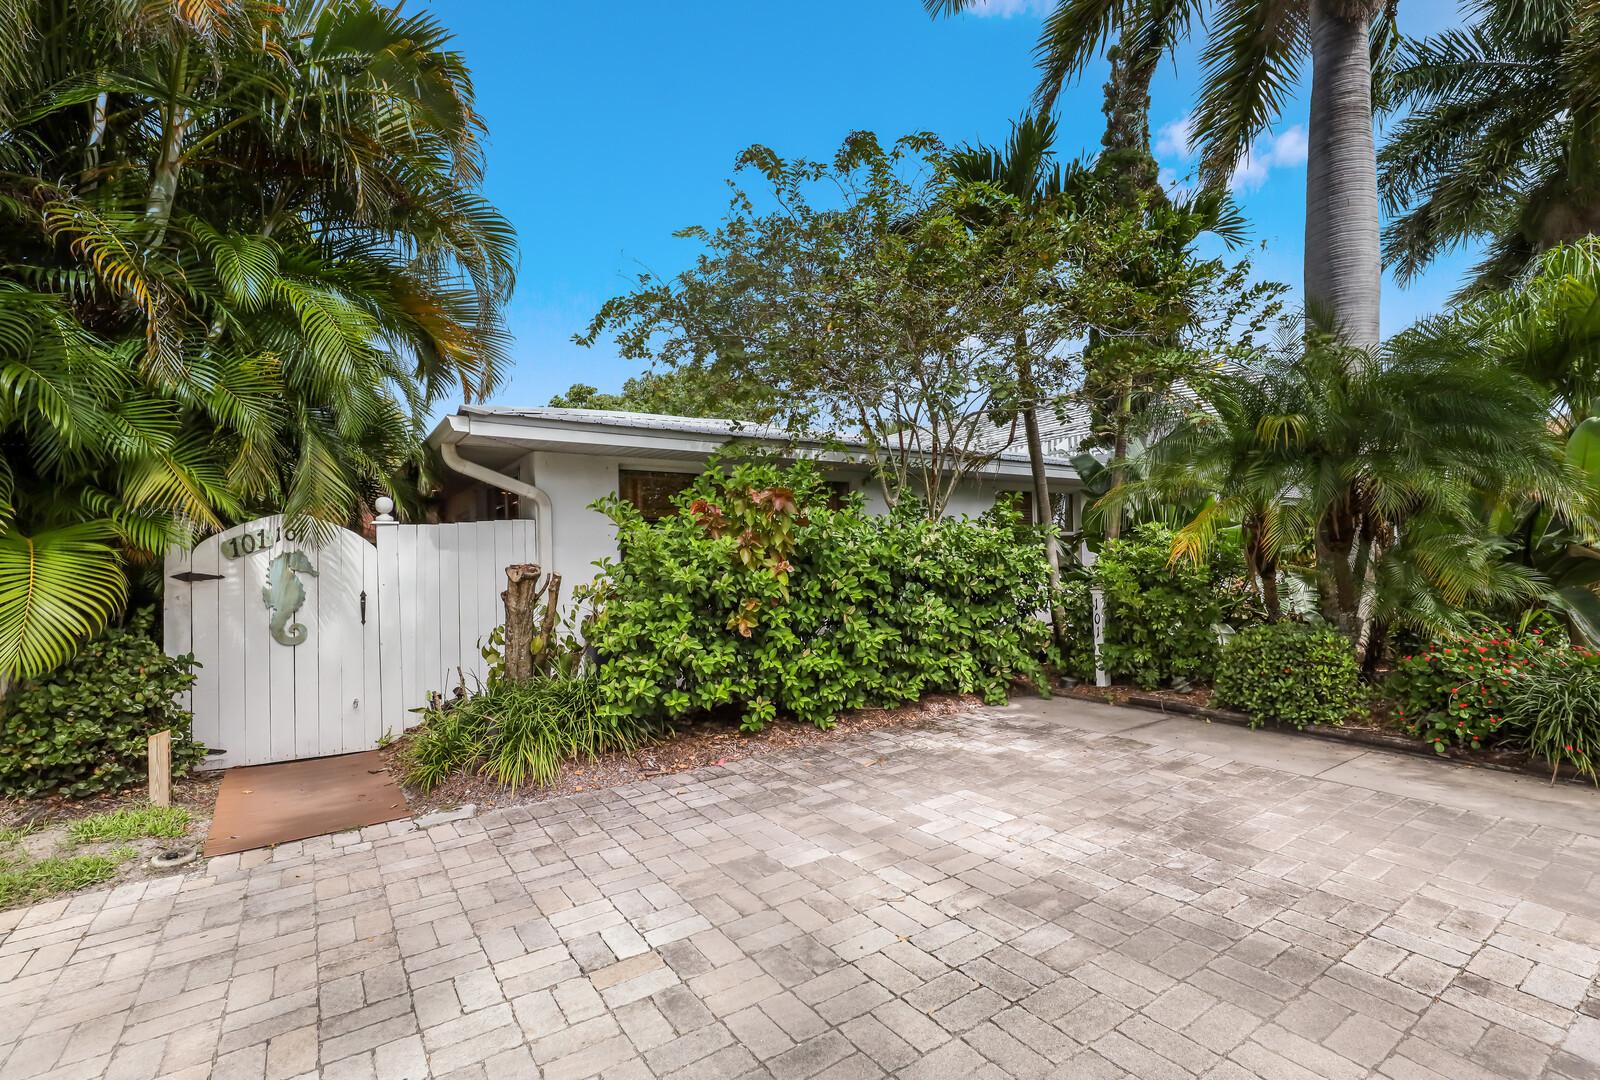 Palm Villa parking and back patio door